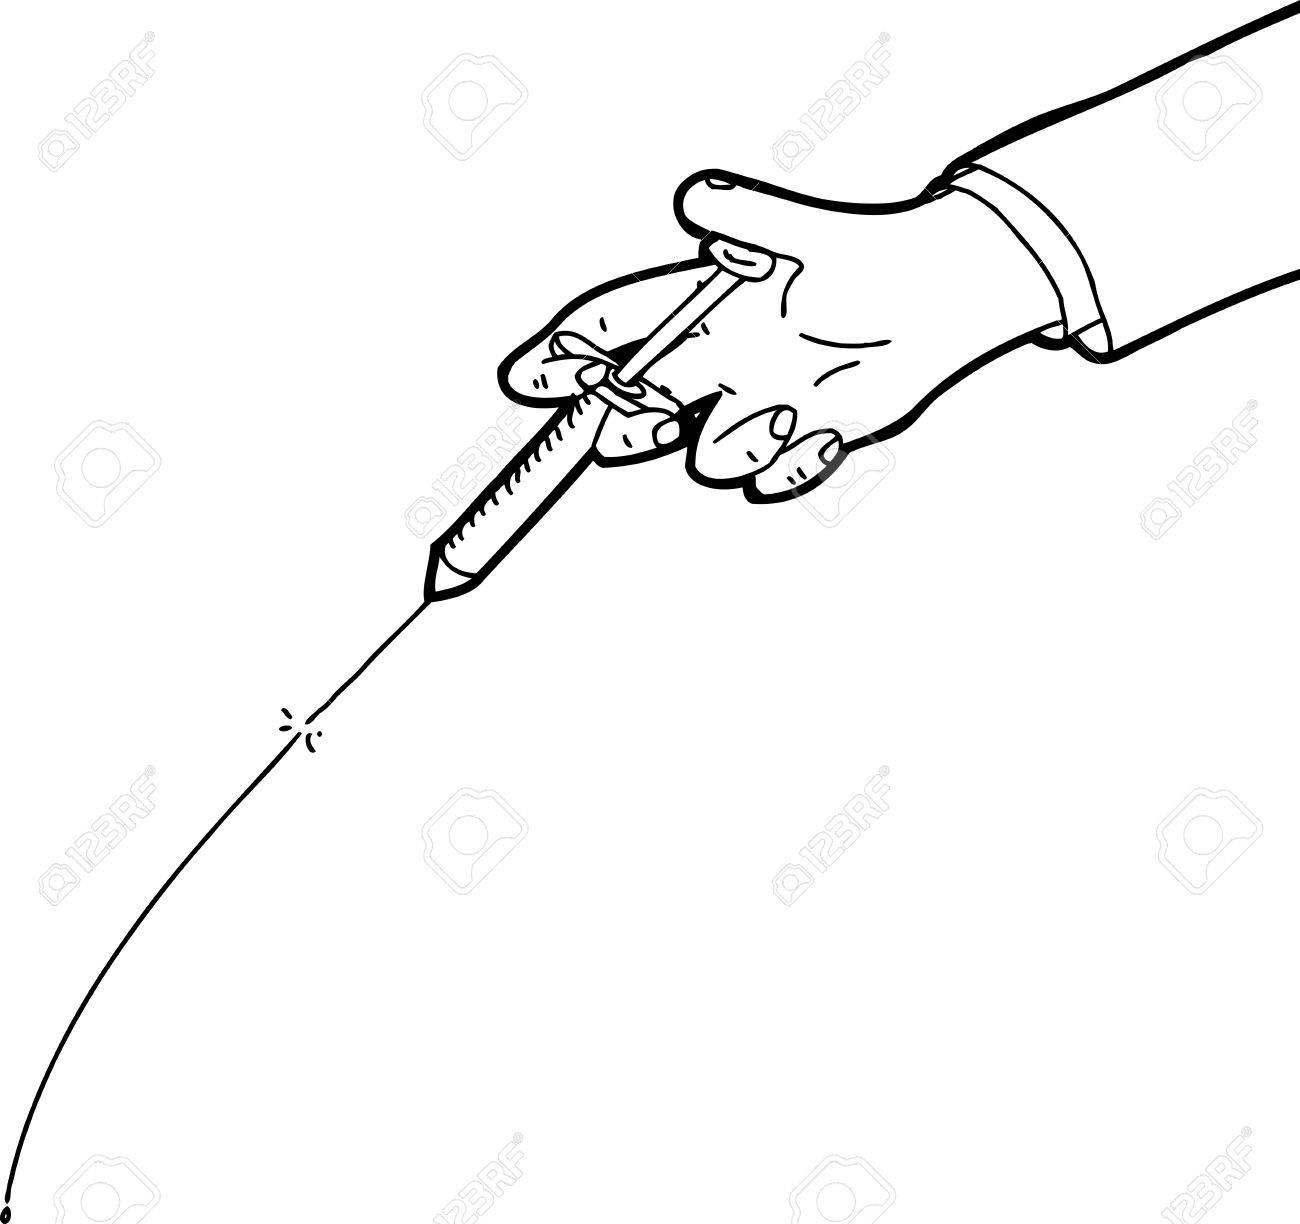 1300x1224 Hand Testing Syringe Outline Cartoon Over White Royalty Free